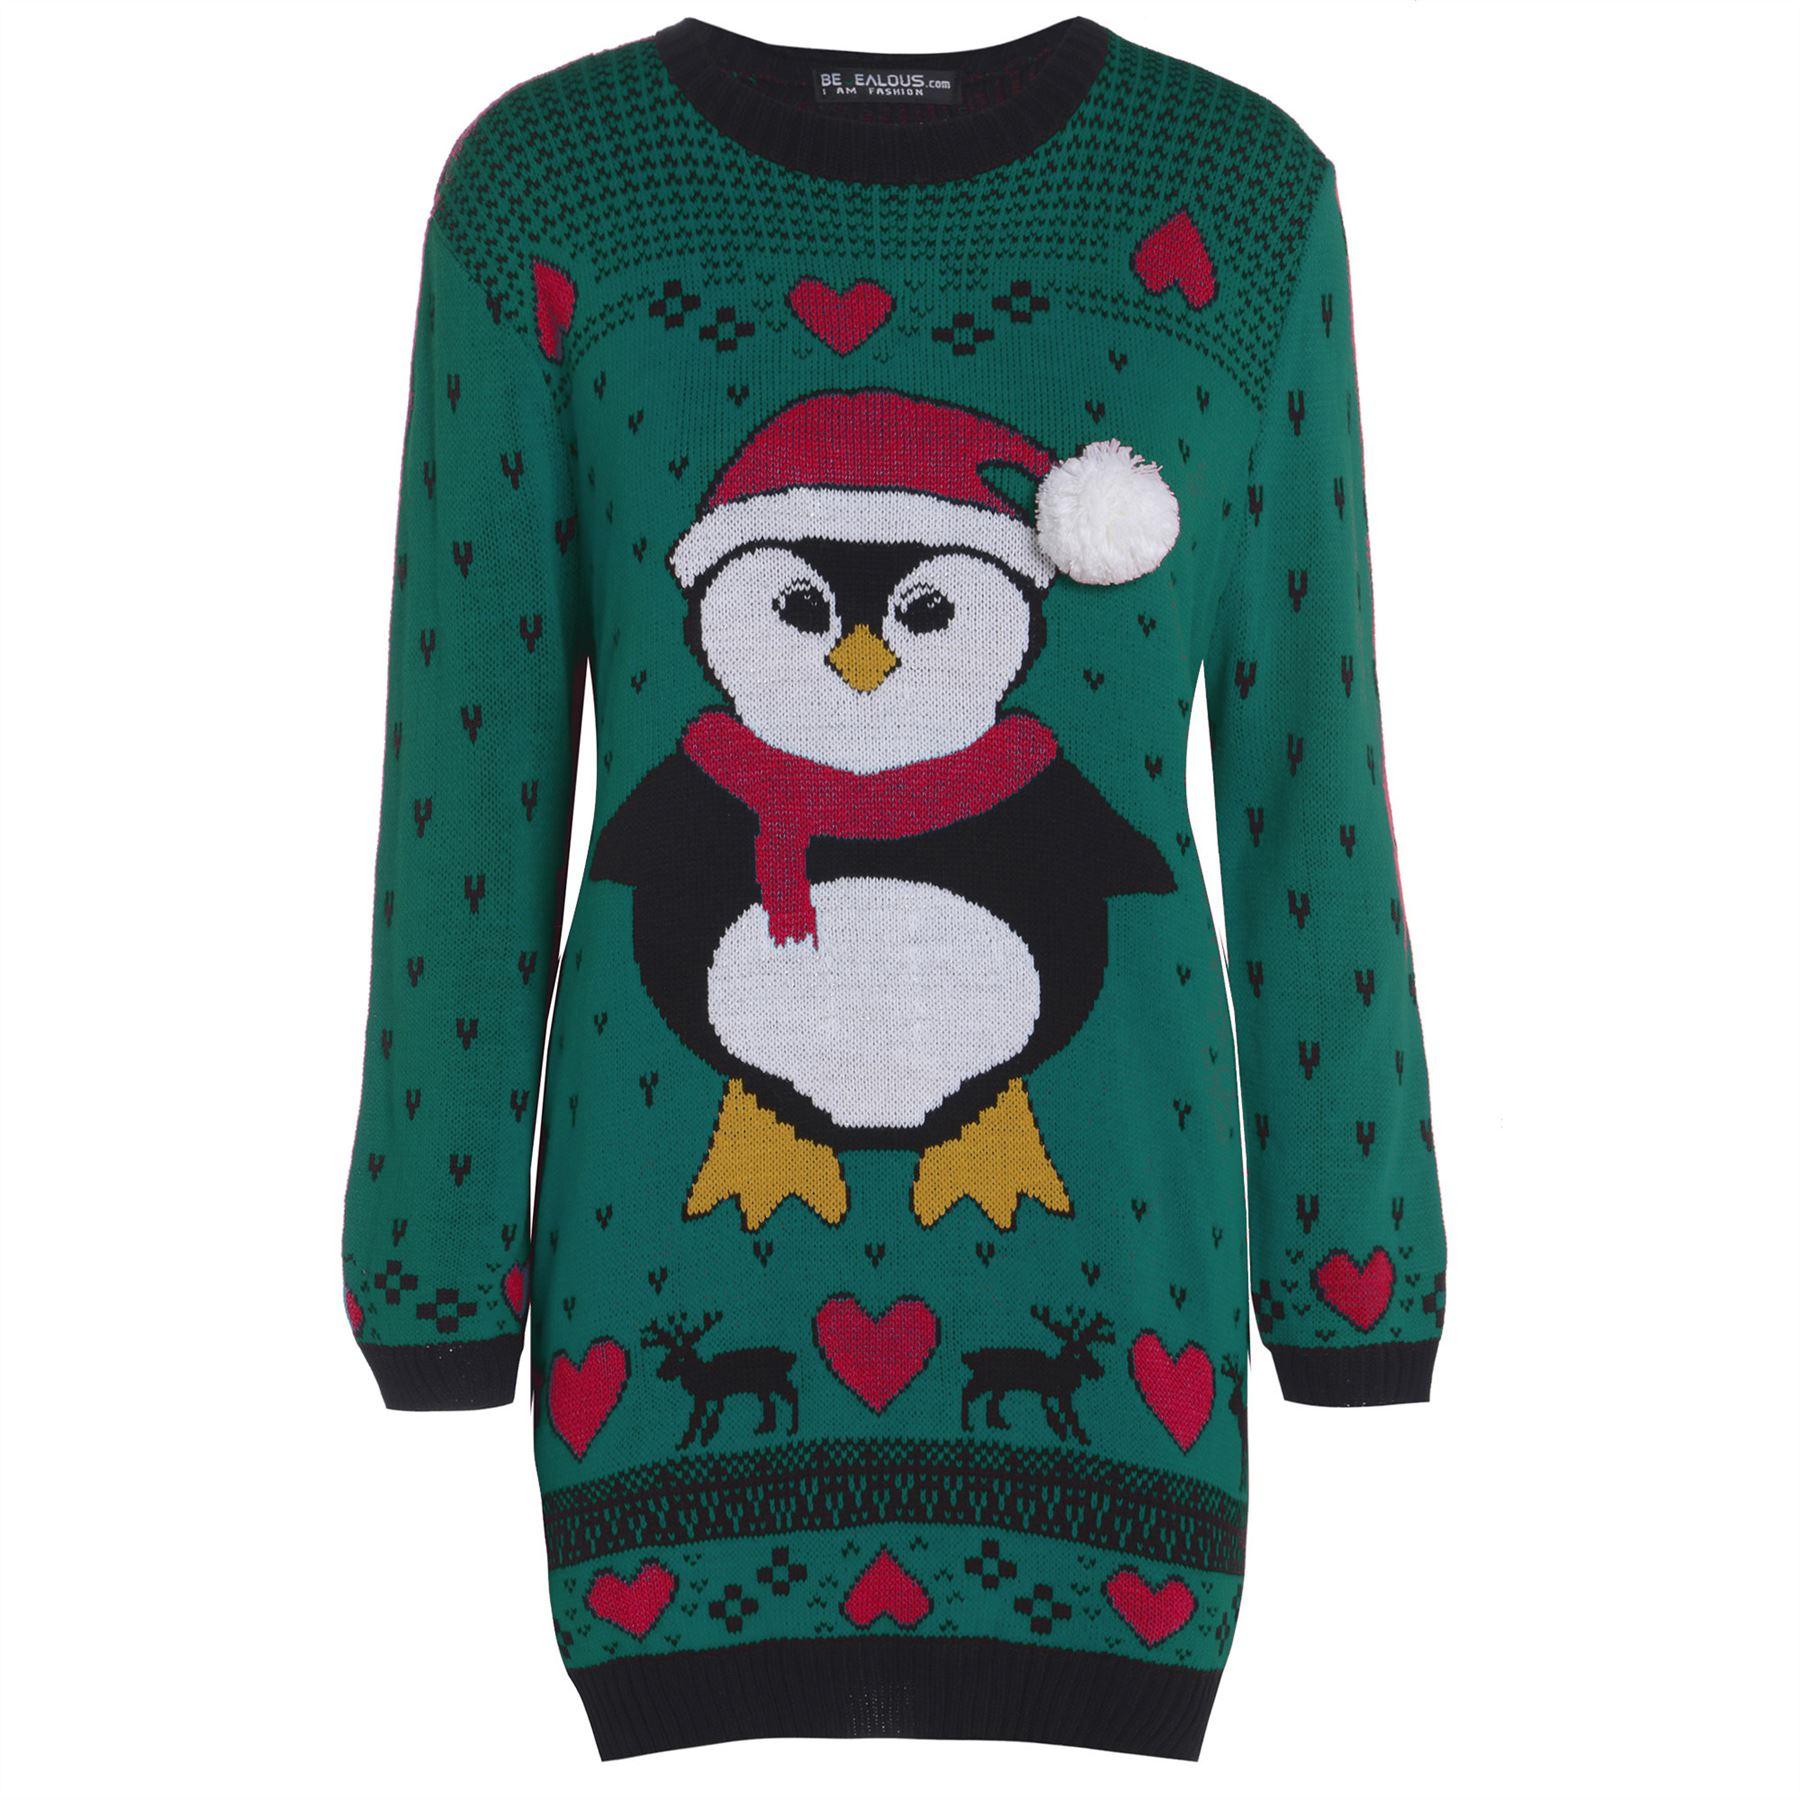 Christmas Tree Sweater Womens: Womens Ladies Snowman Xmas Christmas Tree Knitted Dress